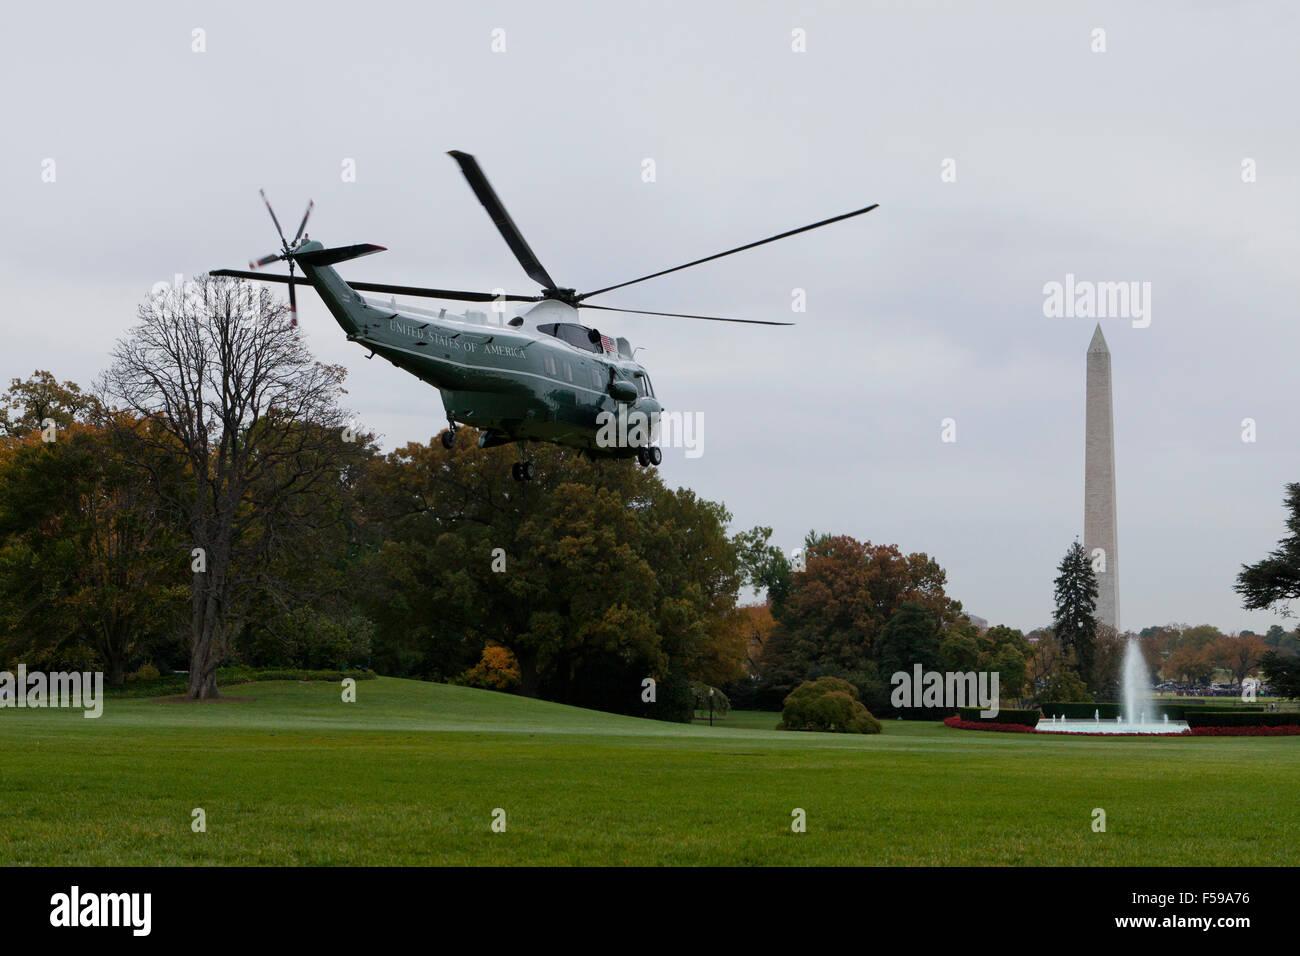 US Marine One helicopter departing from White House - Washington, DC USA - Stock Image